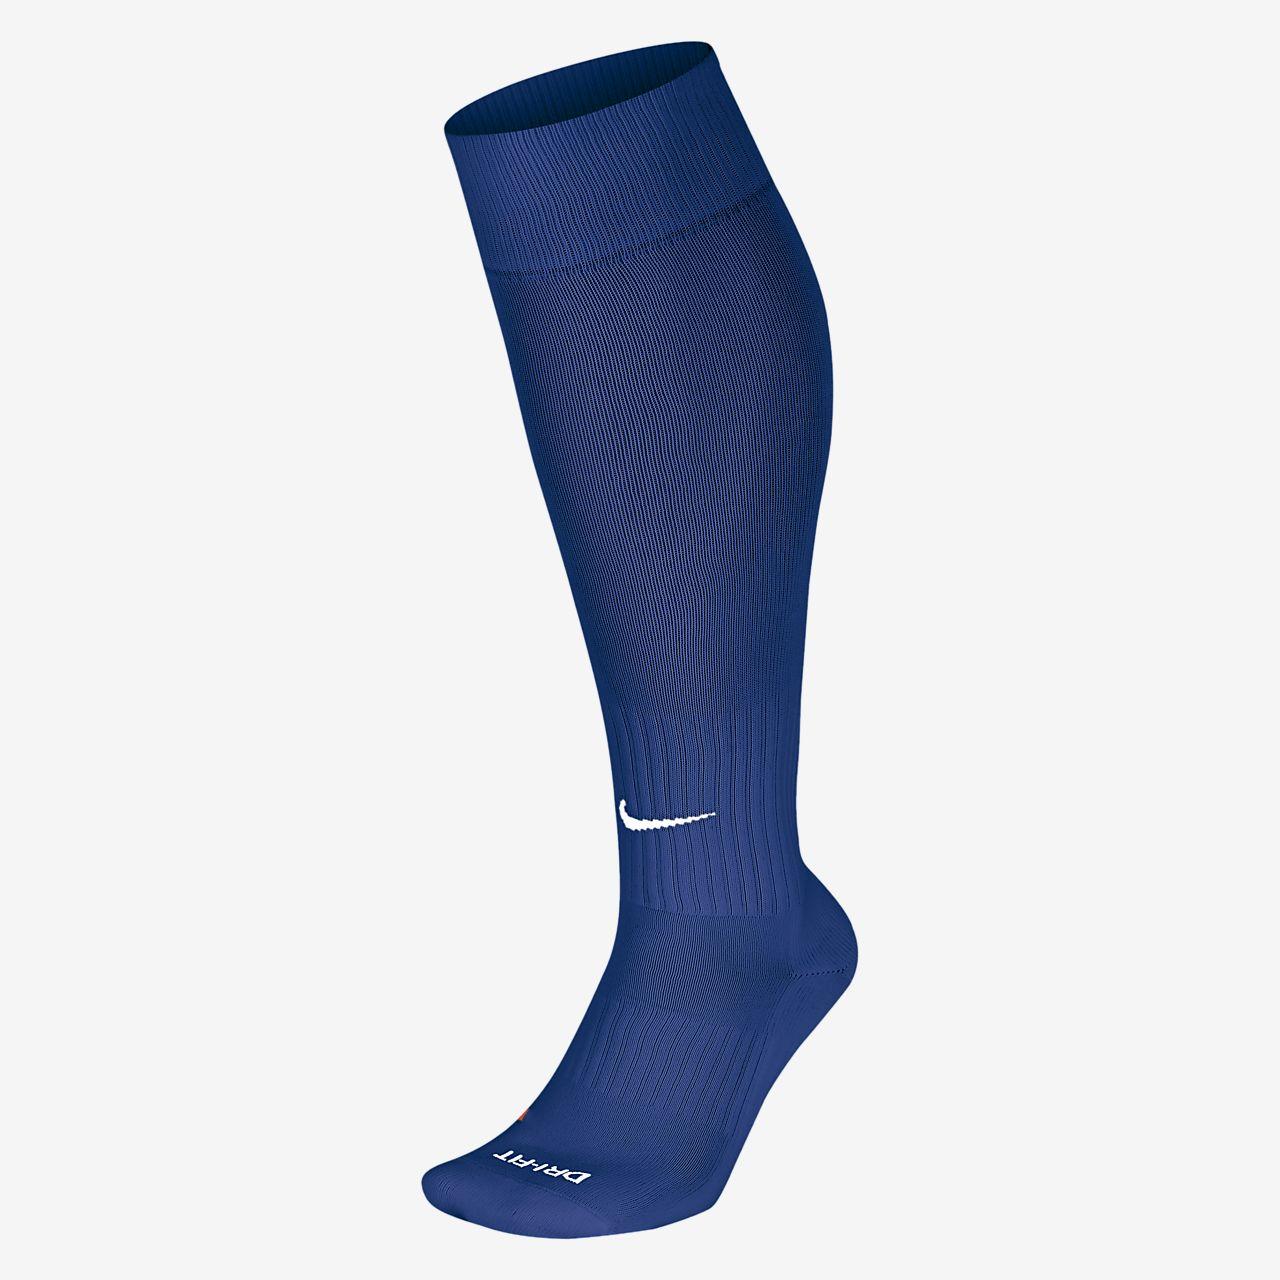 Calzettoni da calcio Nike Academy